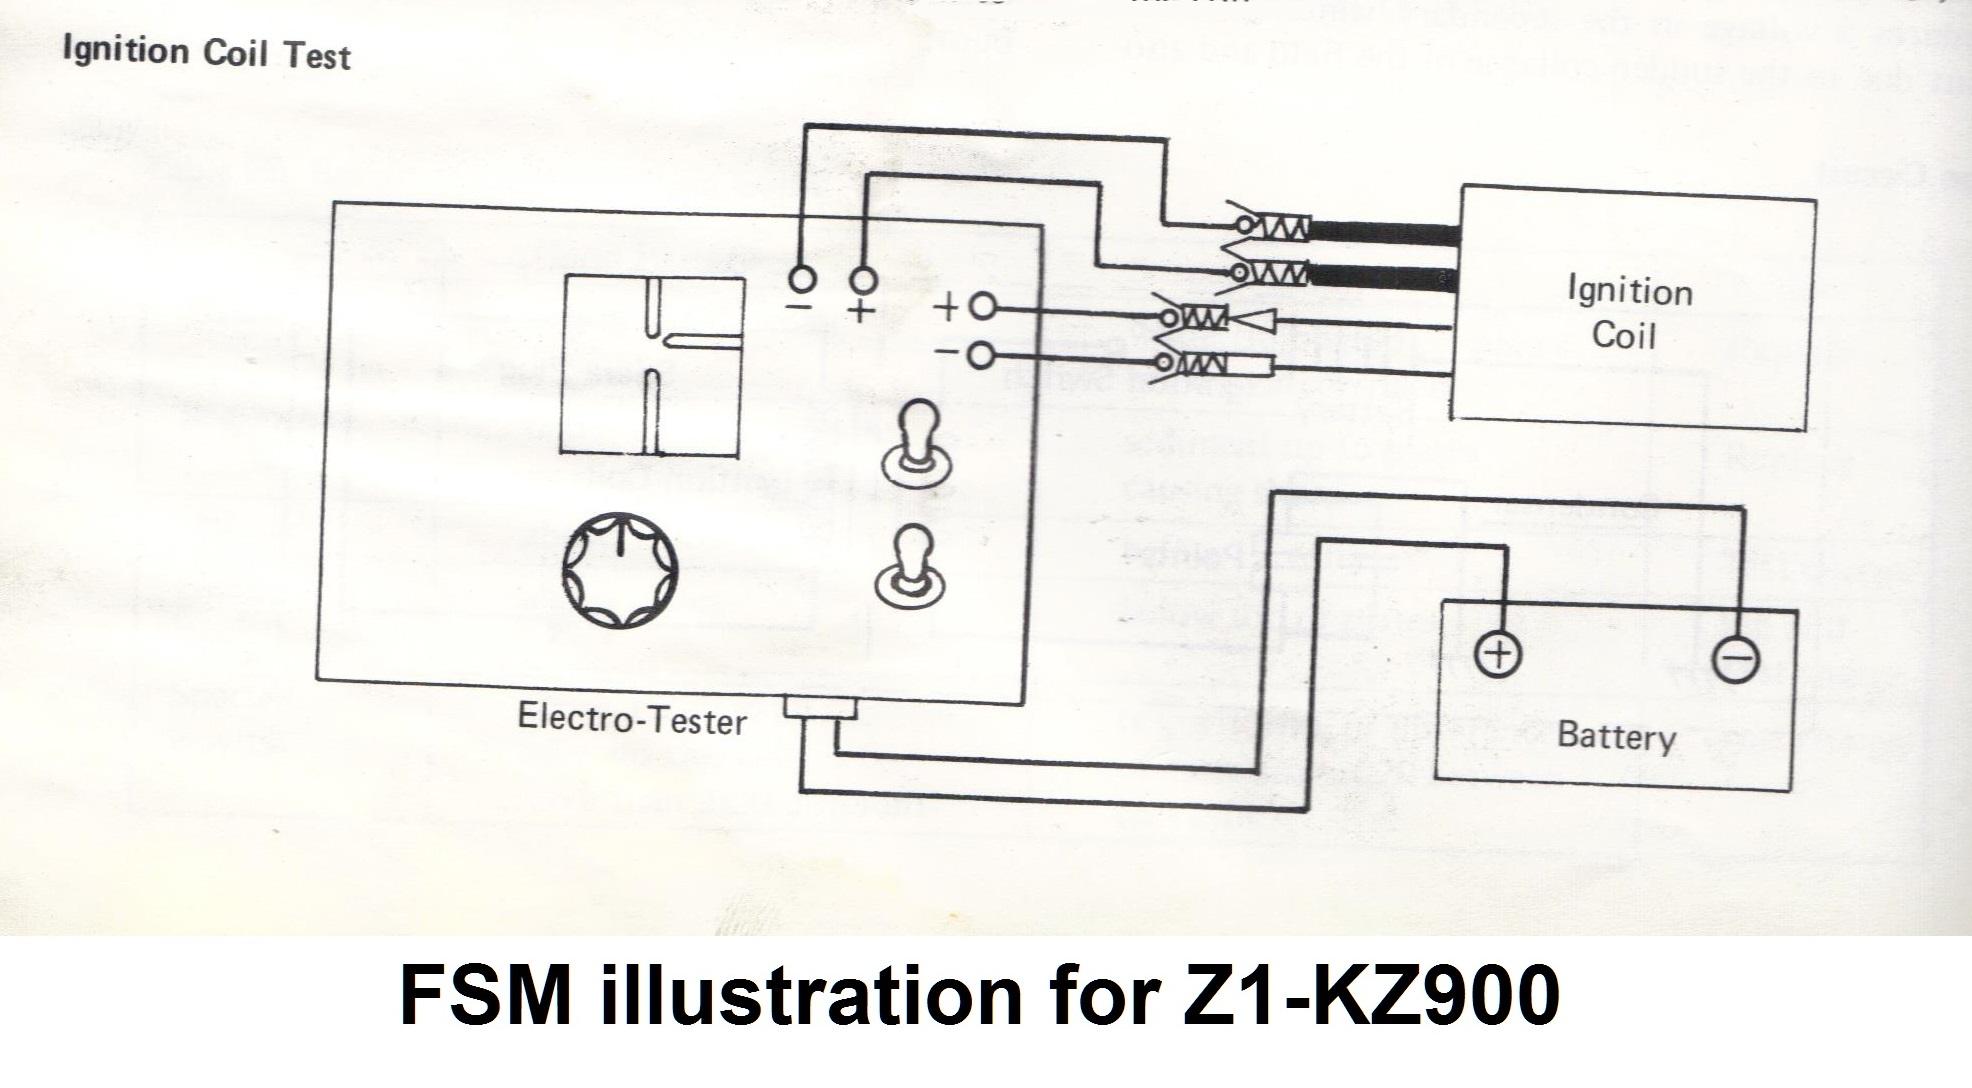 87 honda cx500 wiring diagram wiring diagram third level  87 honda cx500 wiring diagram auto electrical wiring diagram 1979 honda 750 wiring diagram 87 honda